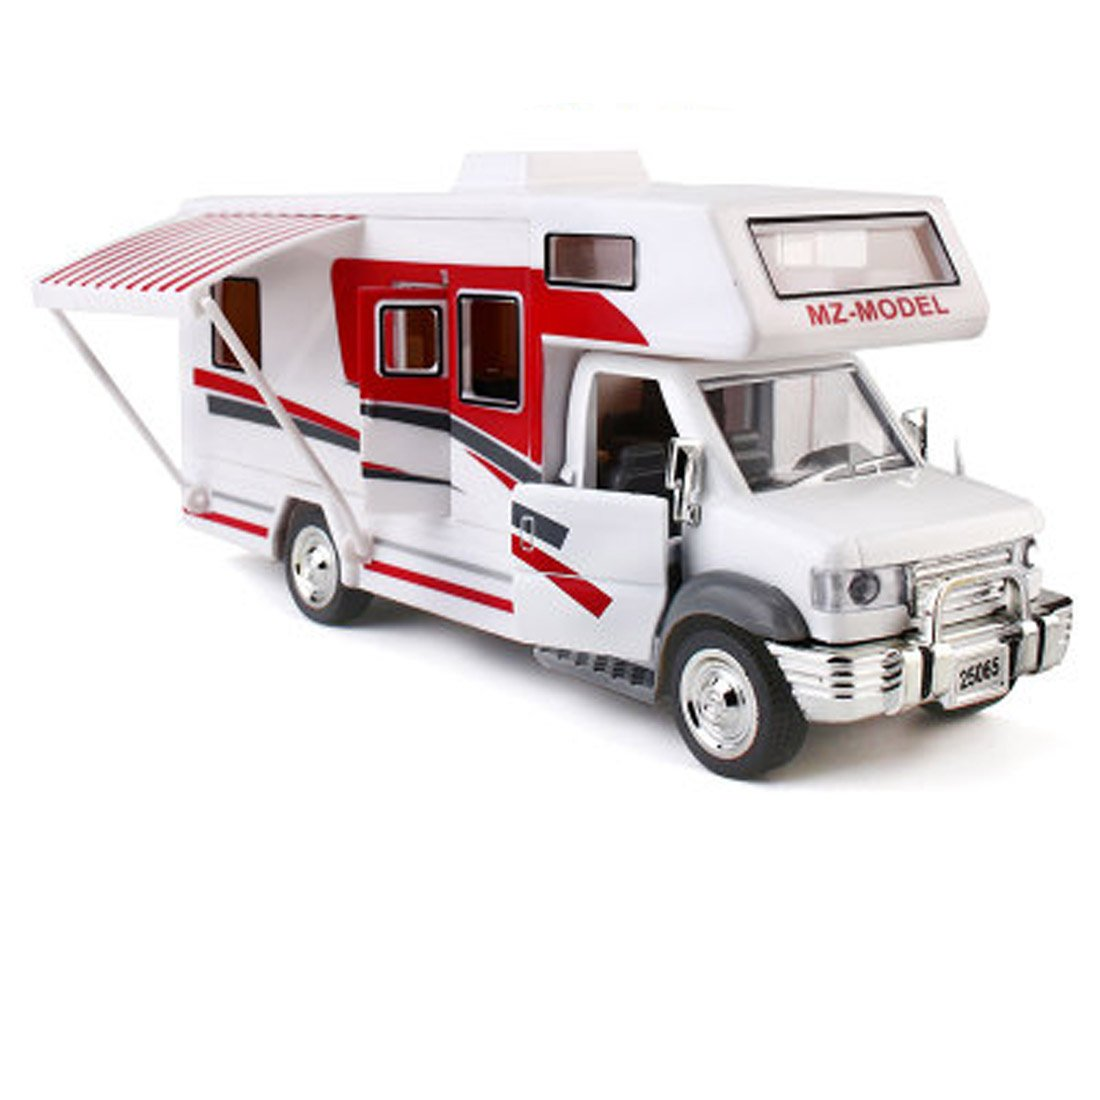 KMT Alloy Diecast RV Recreational Vehicle Motorhome Car Models Dia Cast Model (RV-Type C)